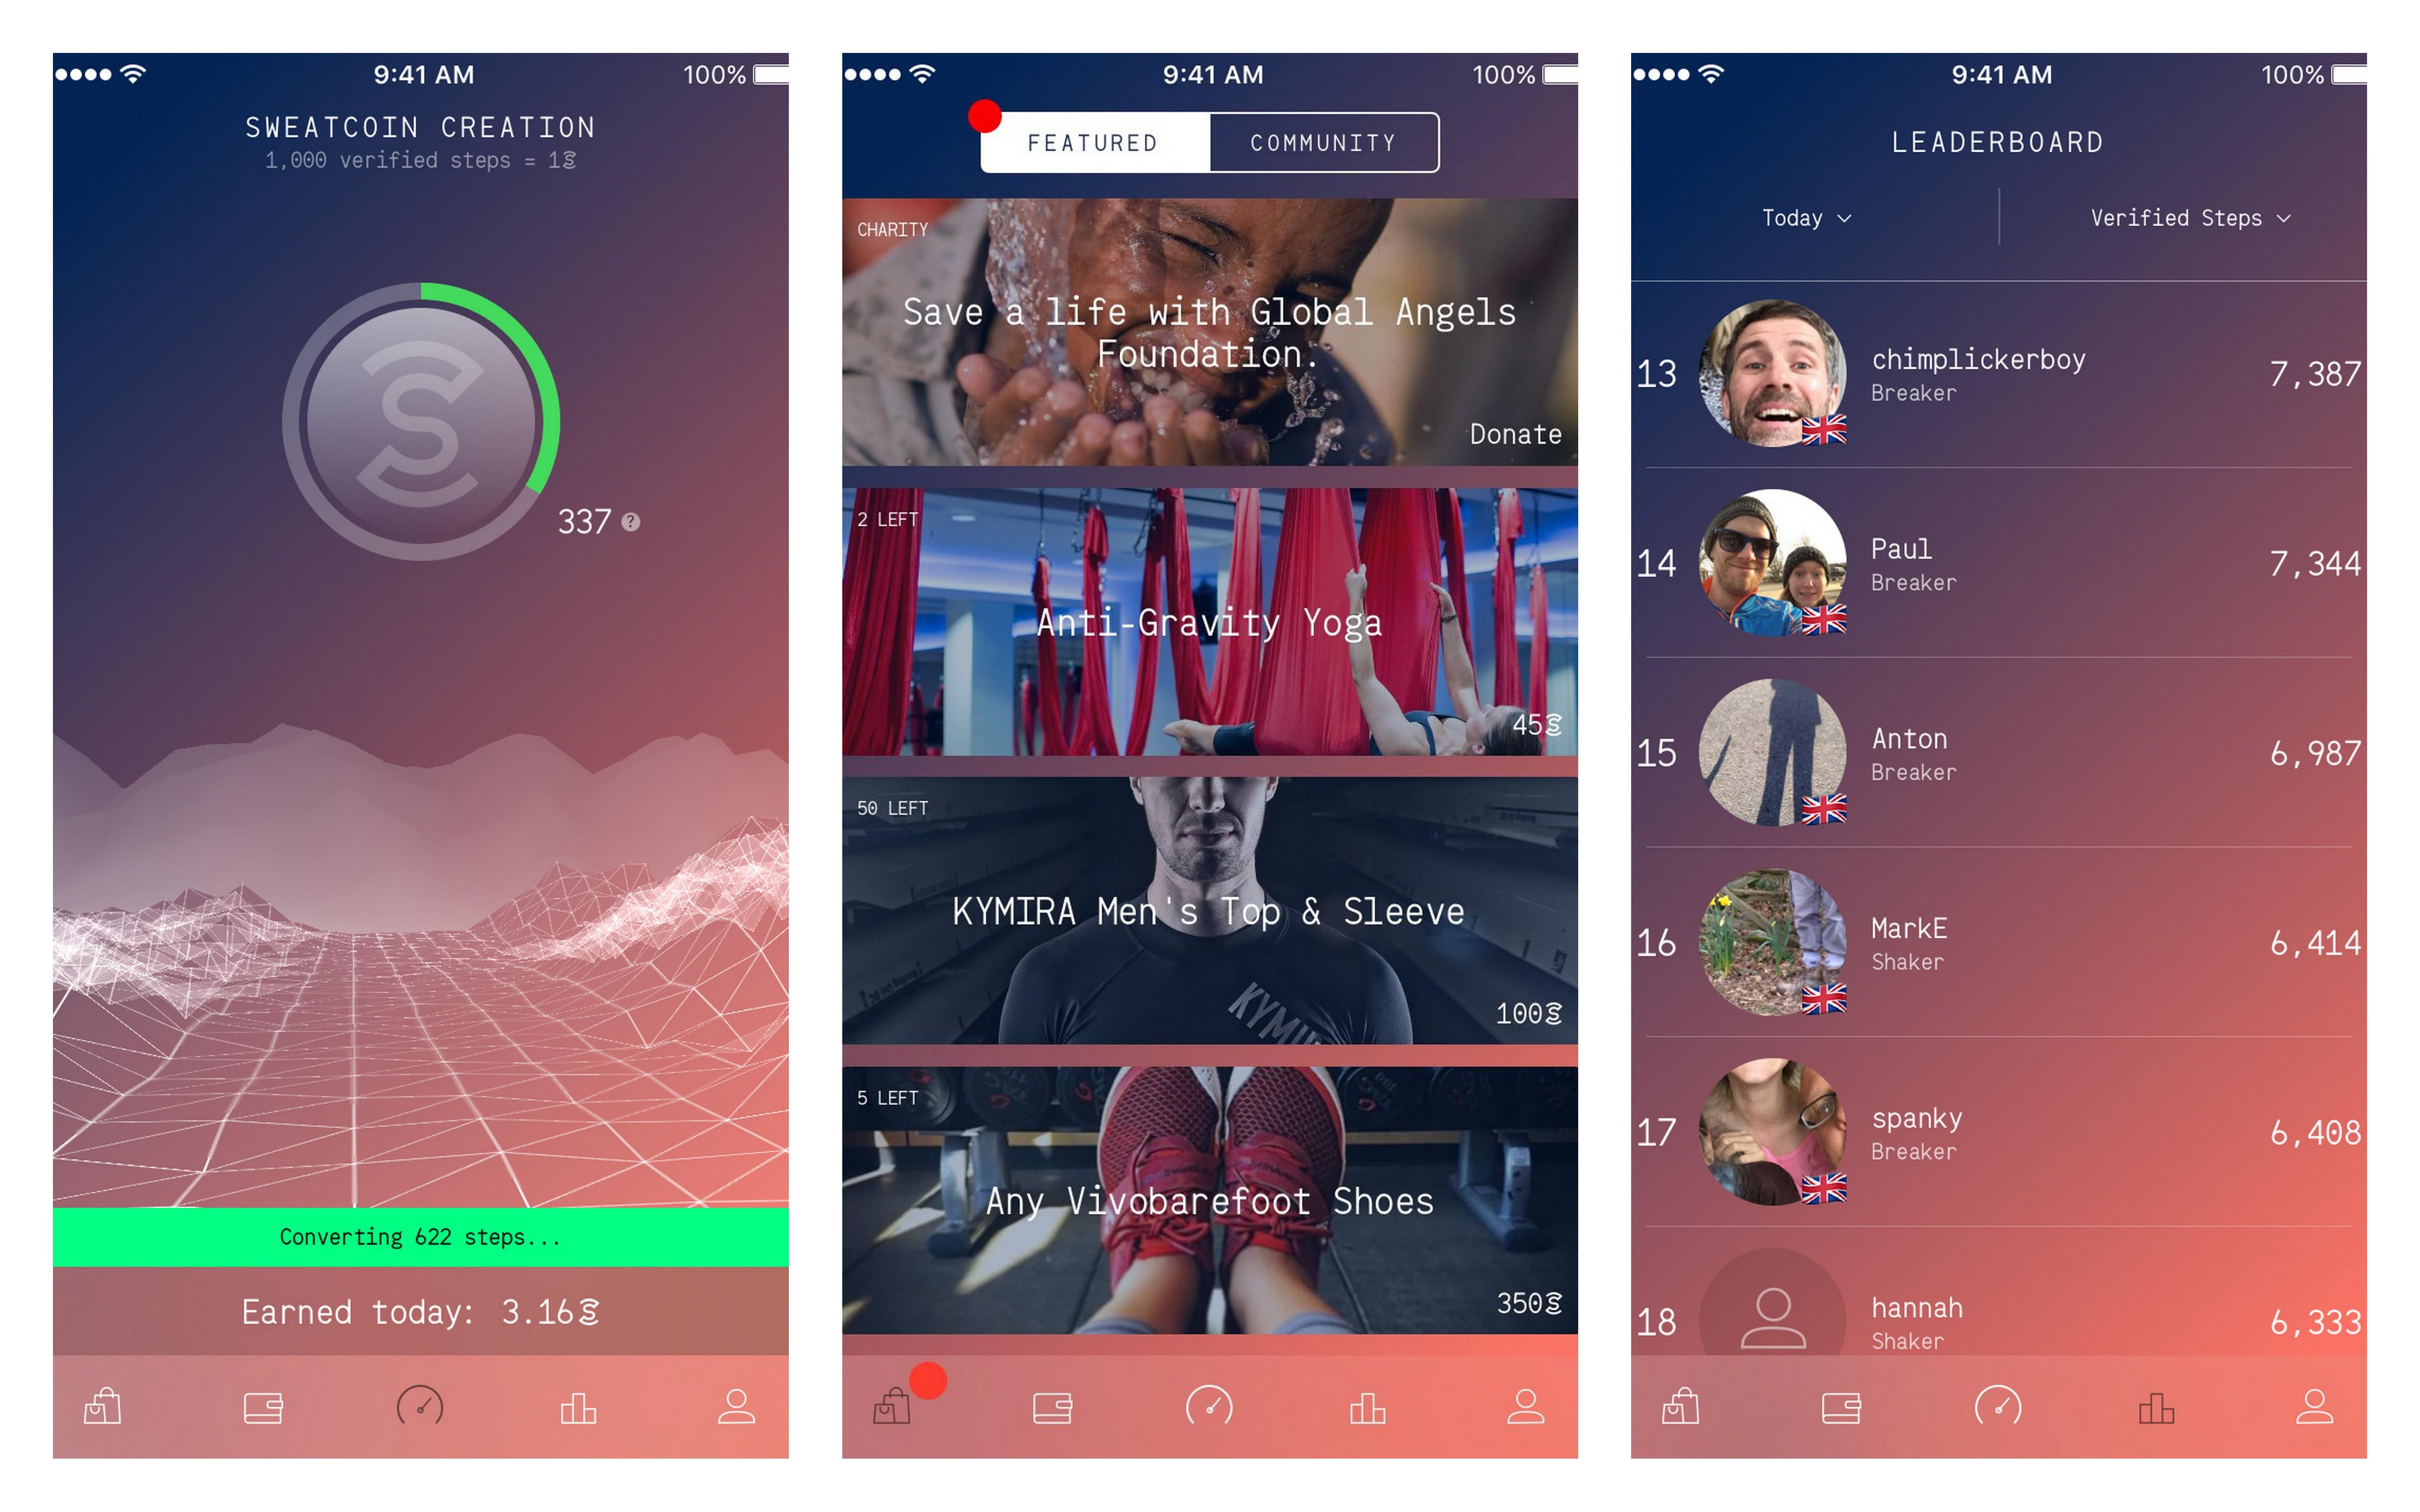 [Gambar: Screenshot tampilan aplikasi Sweatcoin | sweatco.in]